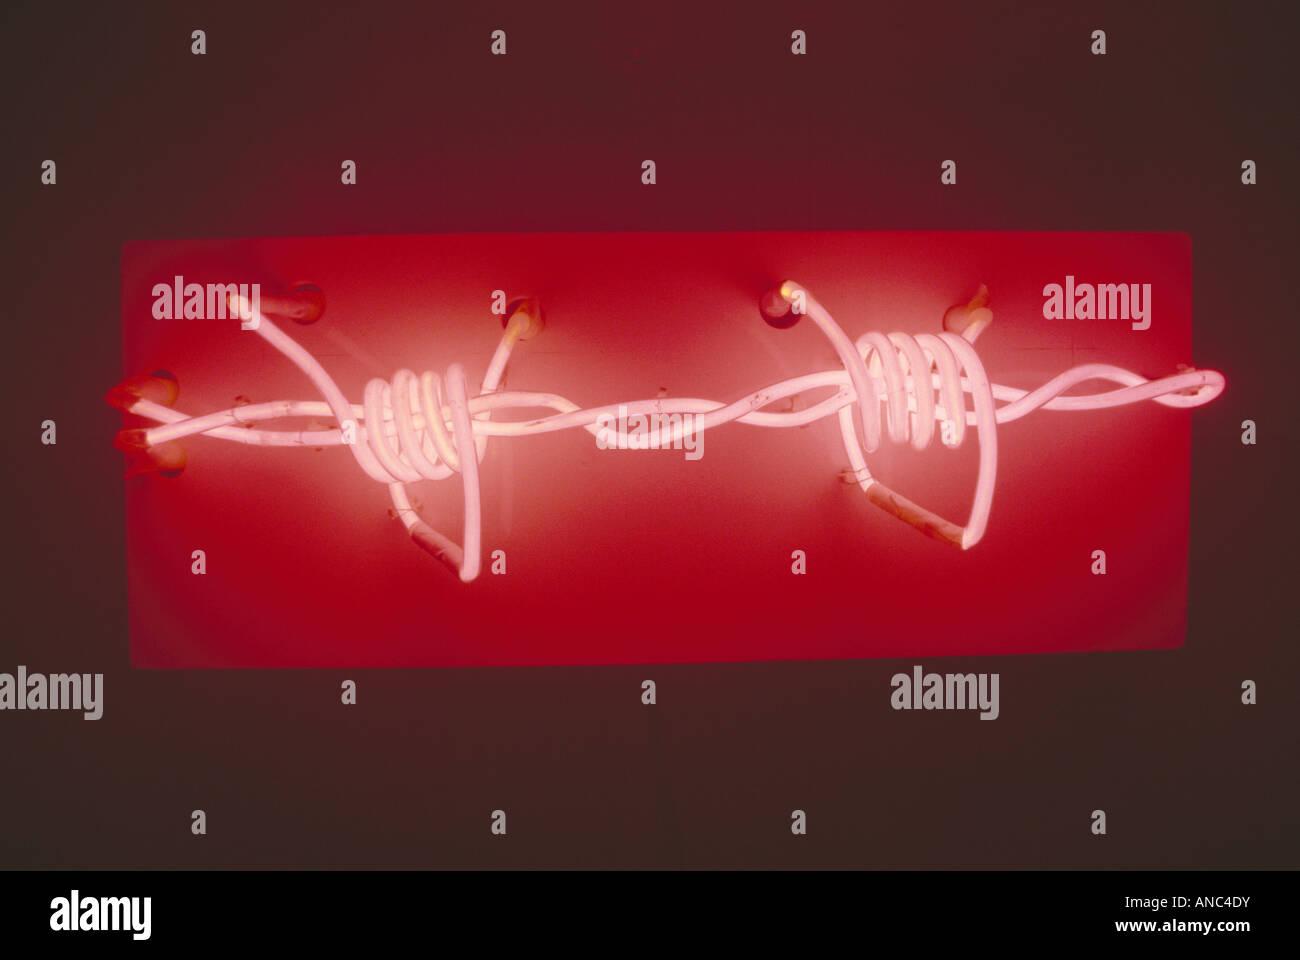 Fein Schaltplan Der Hausbeleuchtung Fotos - Schaltplan Serie Circuit ...